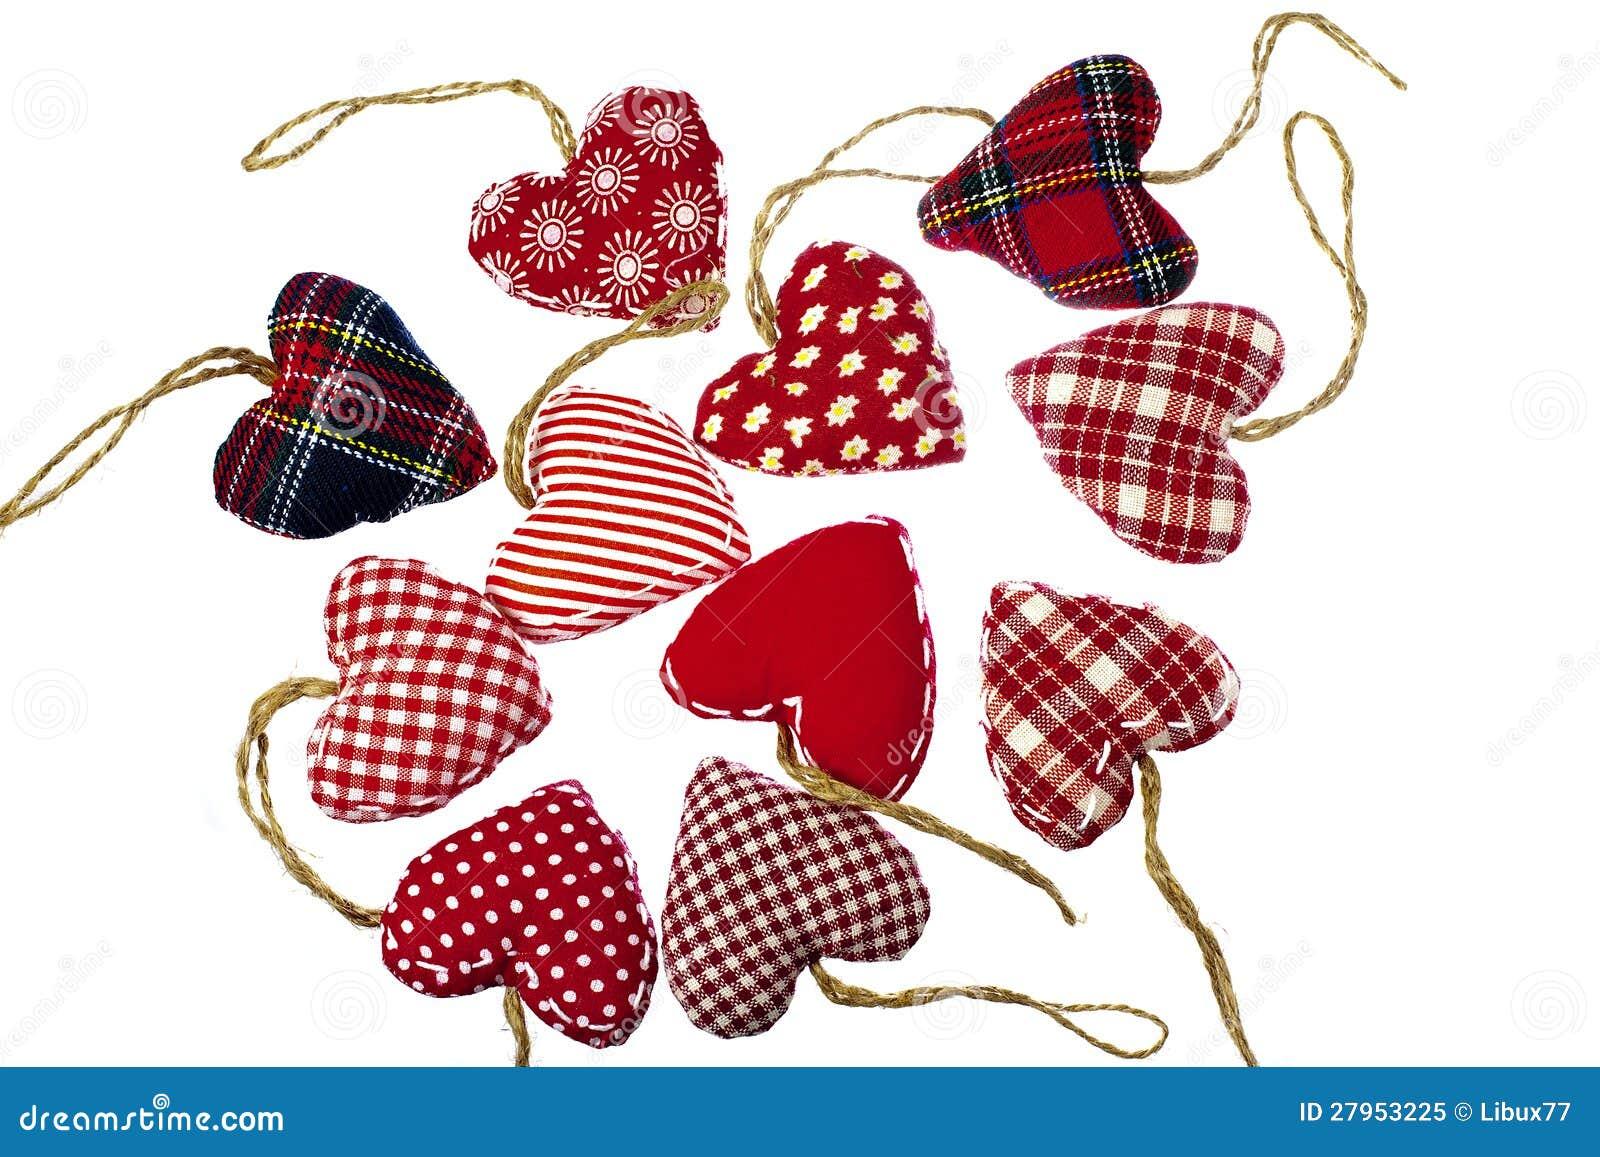 Christmas Tree Hearts Decorations Royalty Free Stock Photo - Image ...